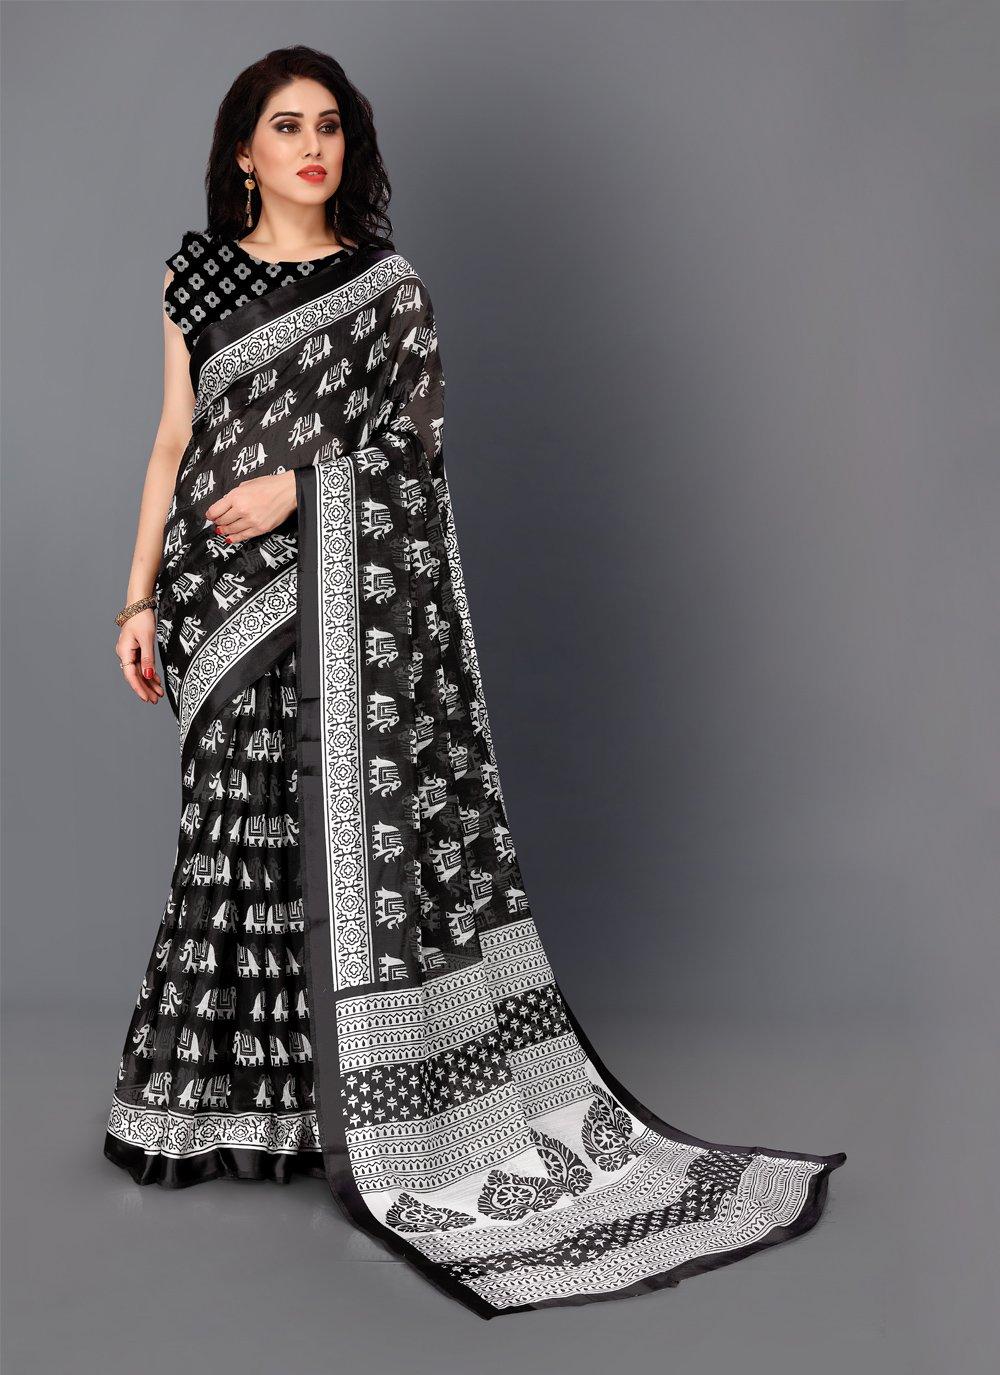 Printed Cotton Black and White Classic Saree